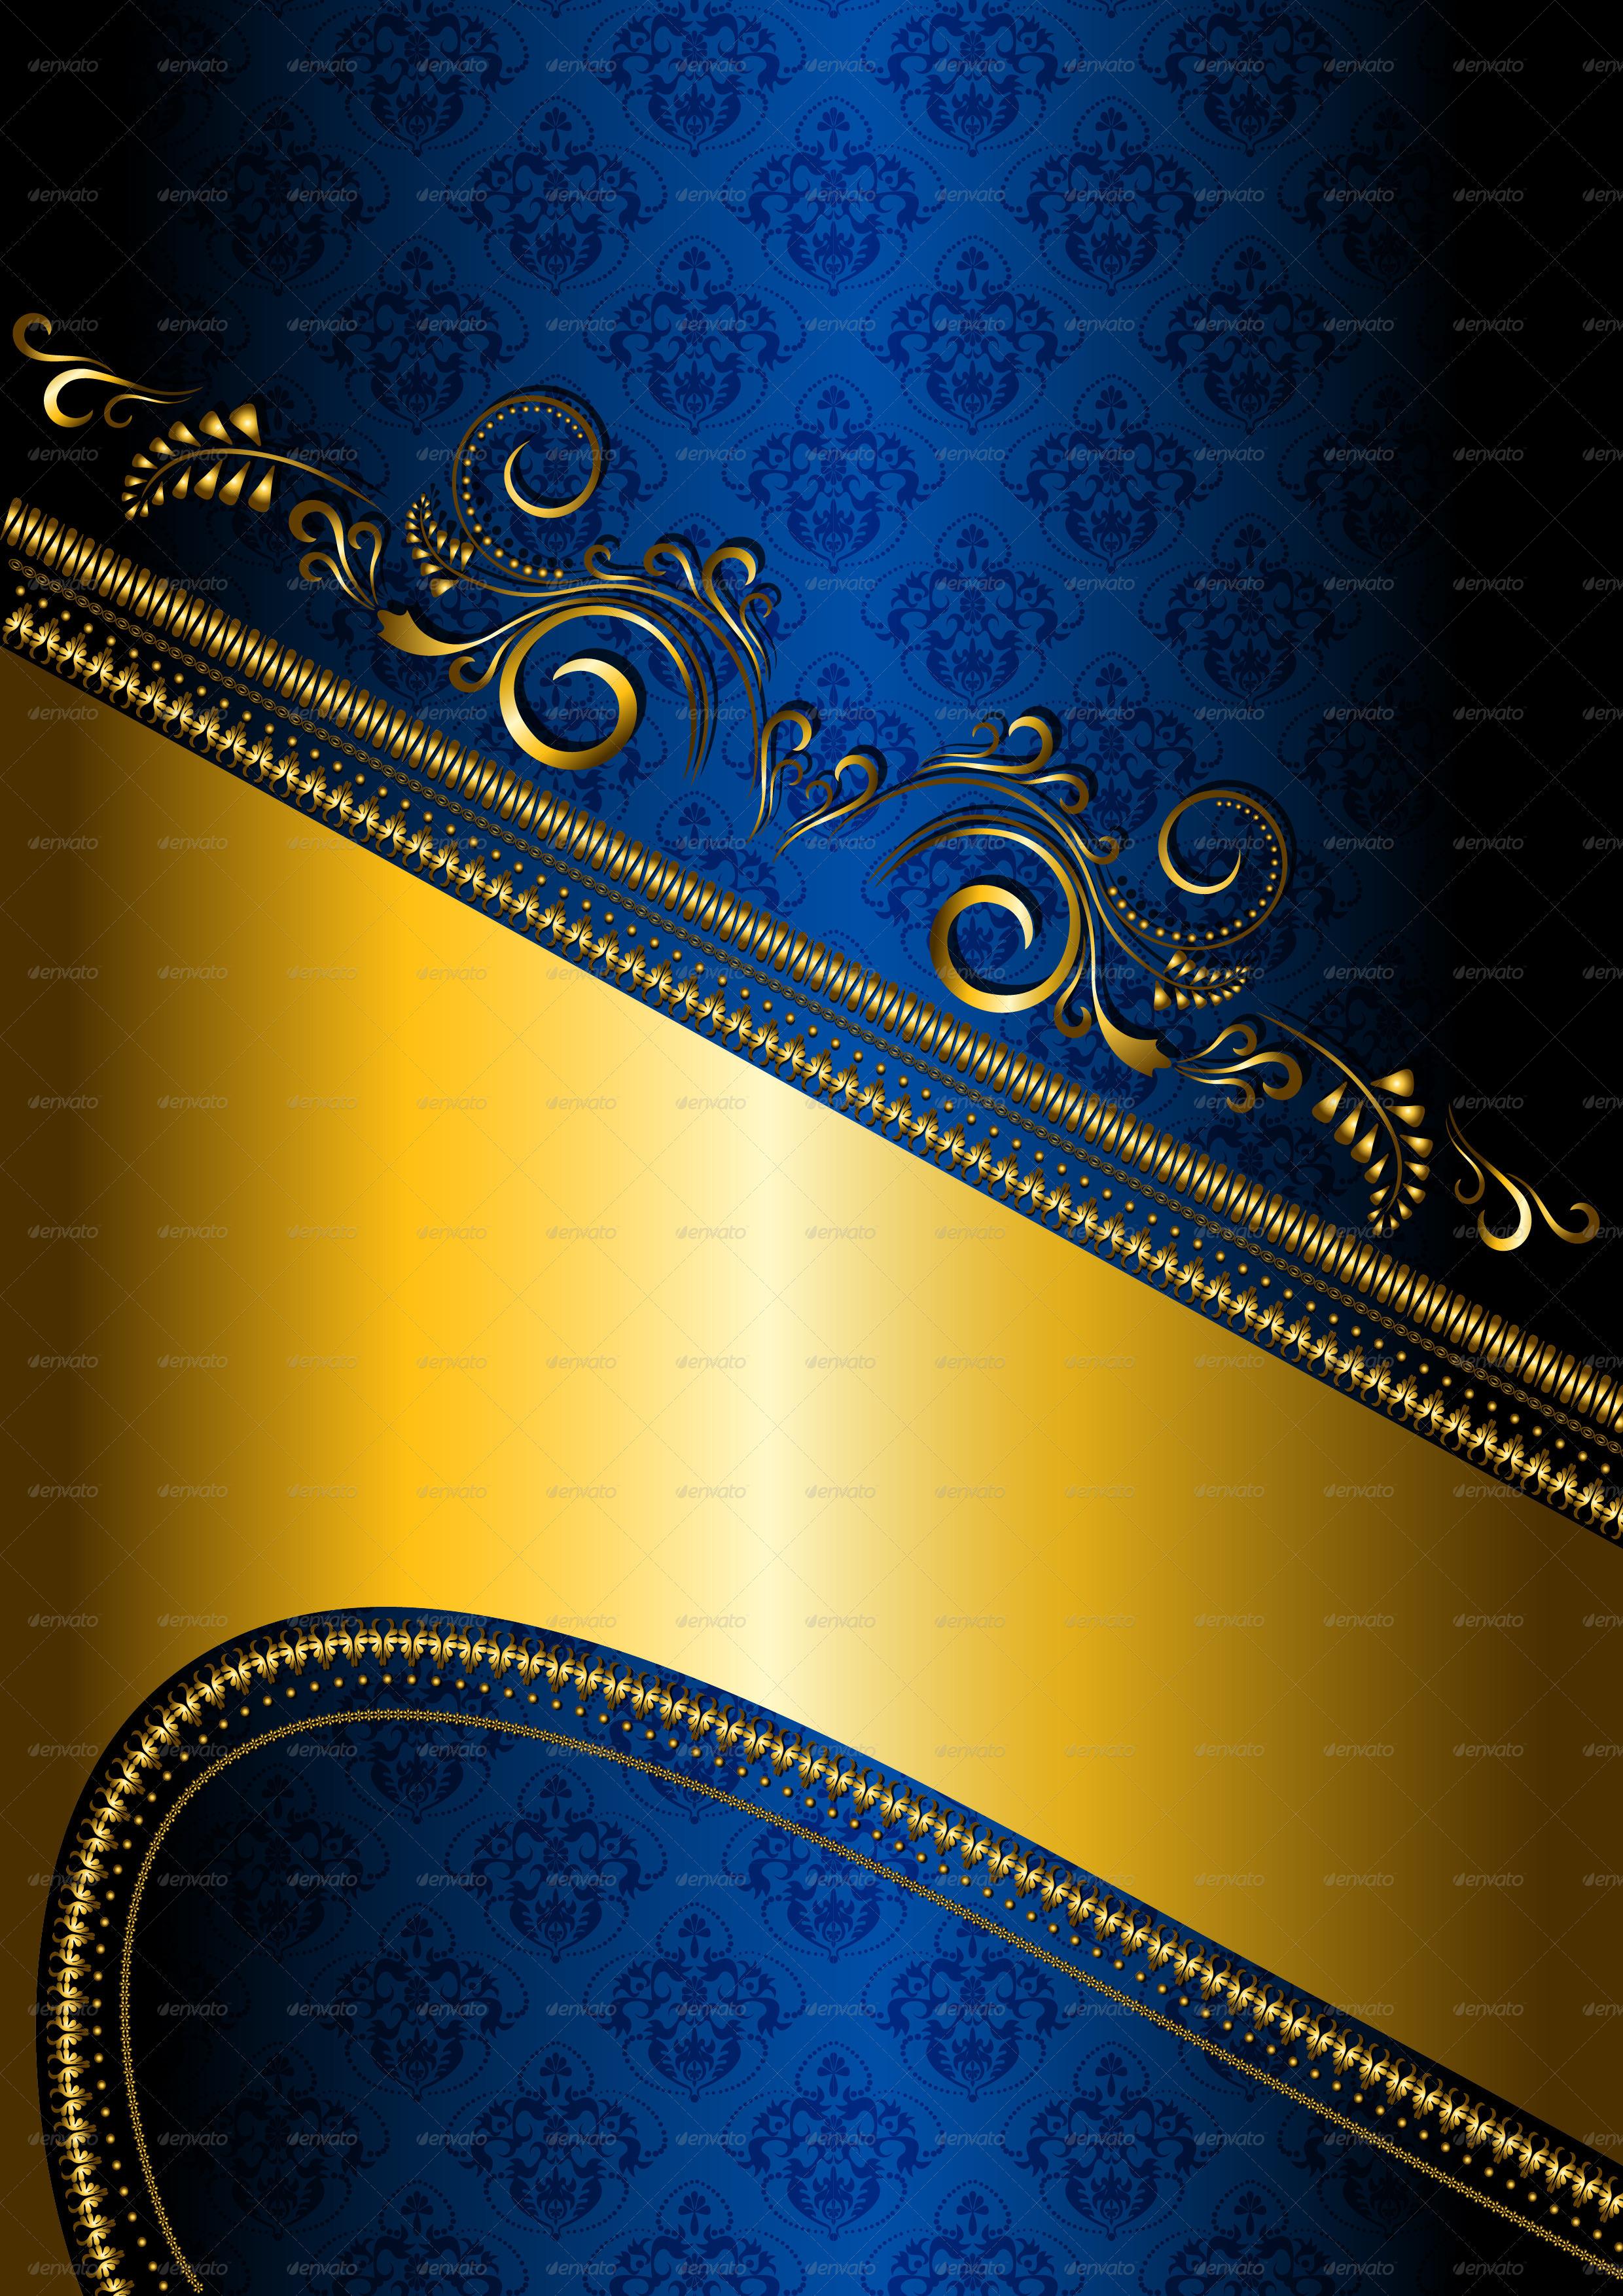 Navy Blue and Gold Wallpaper - WallpaperSafari